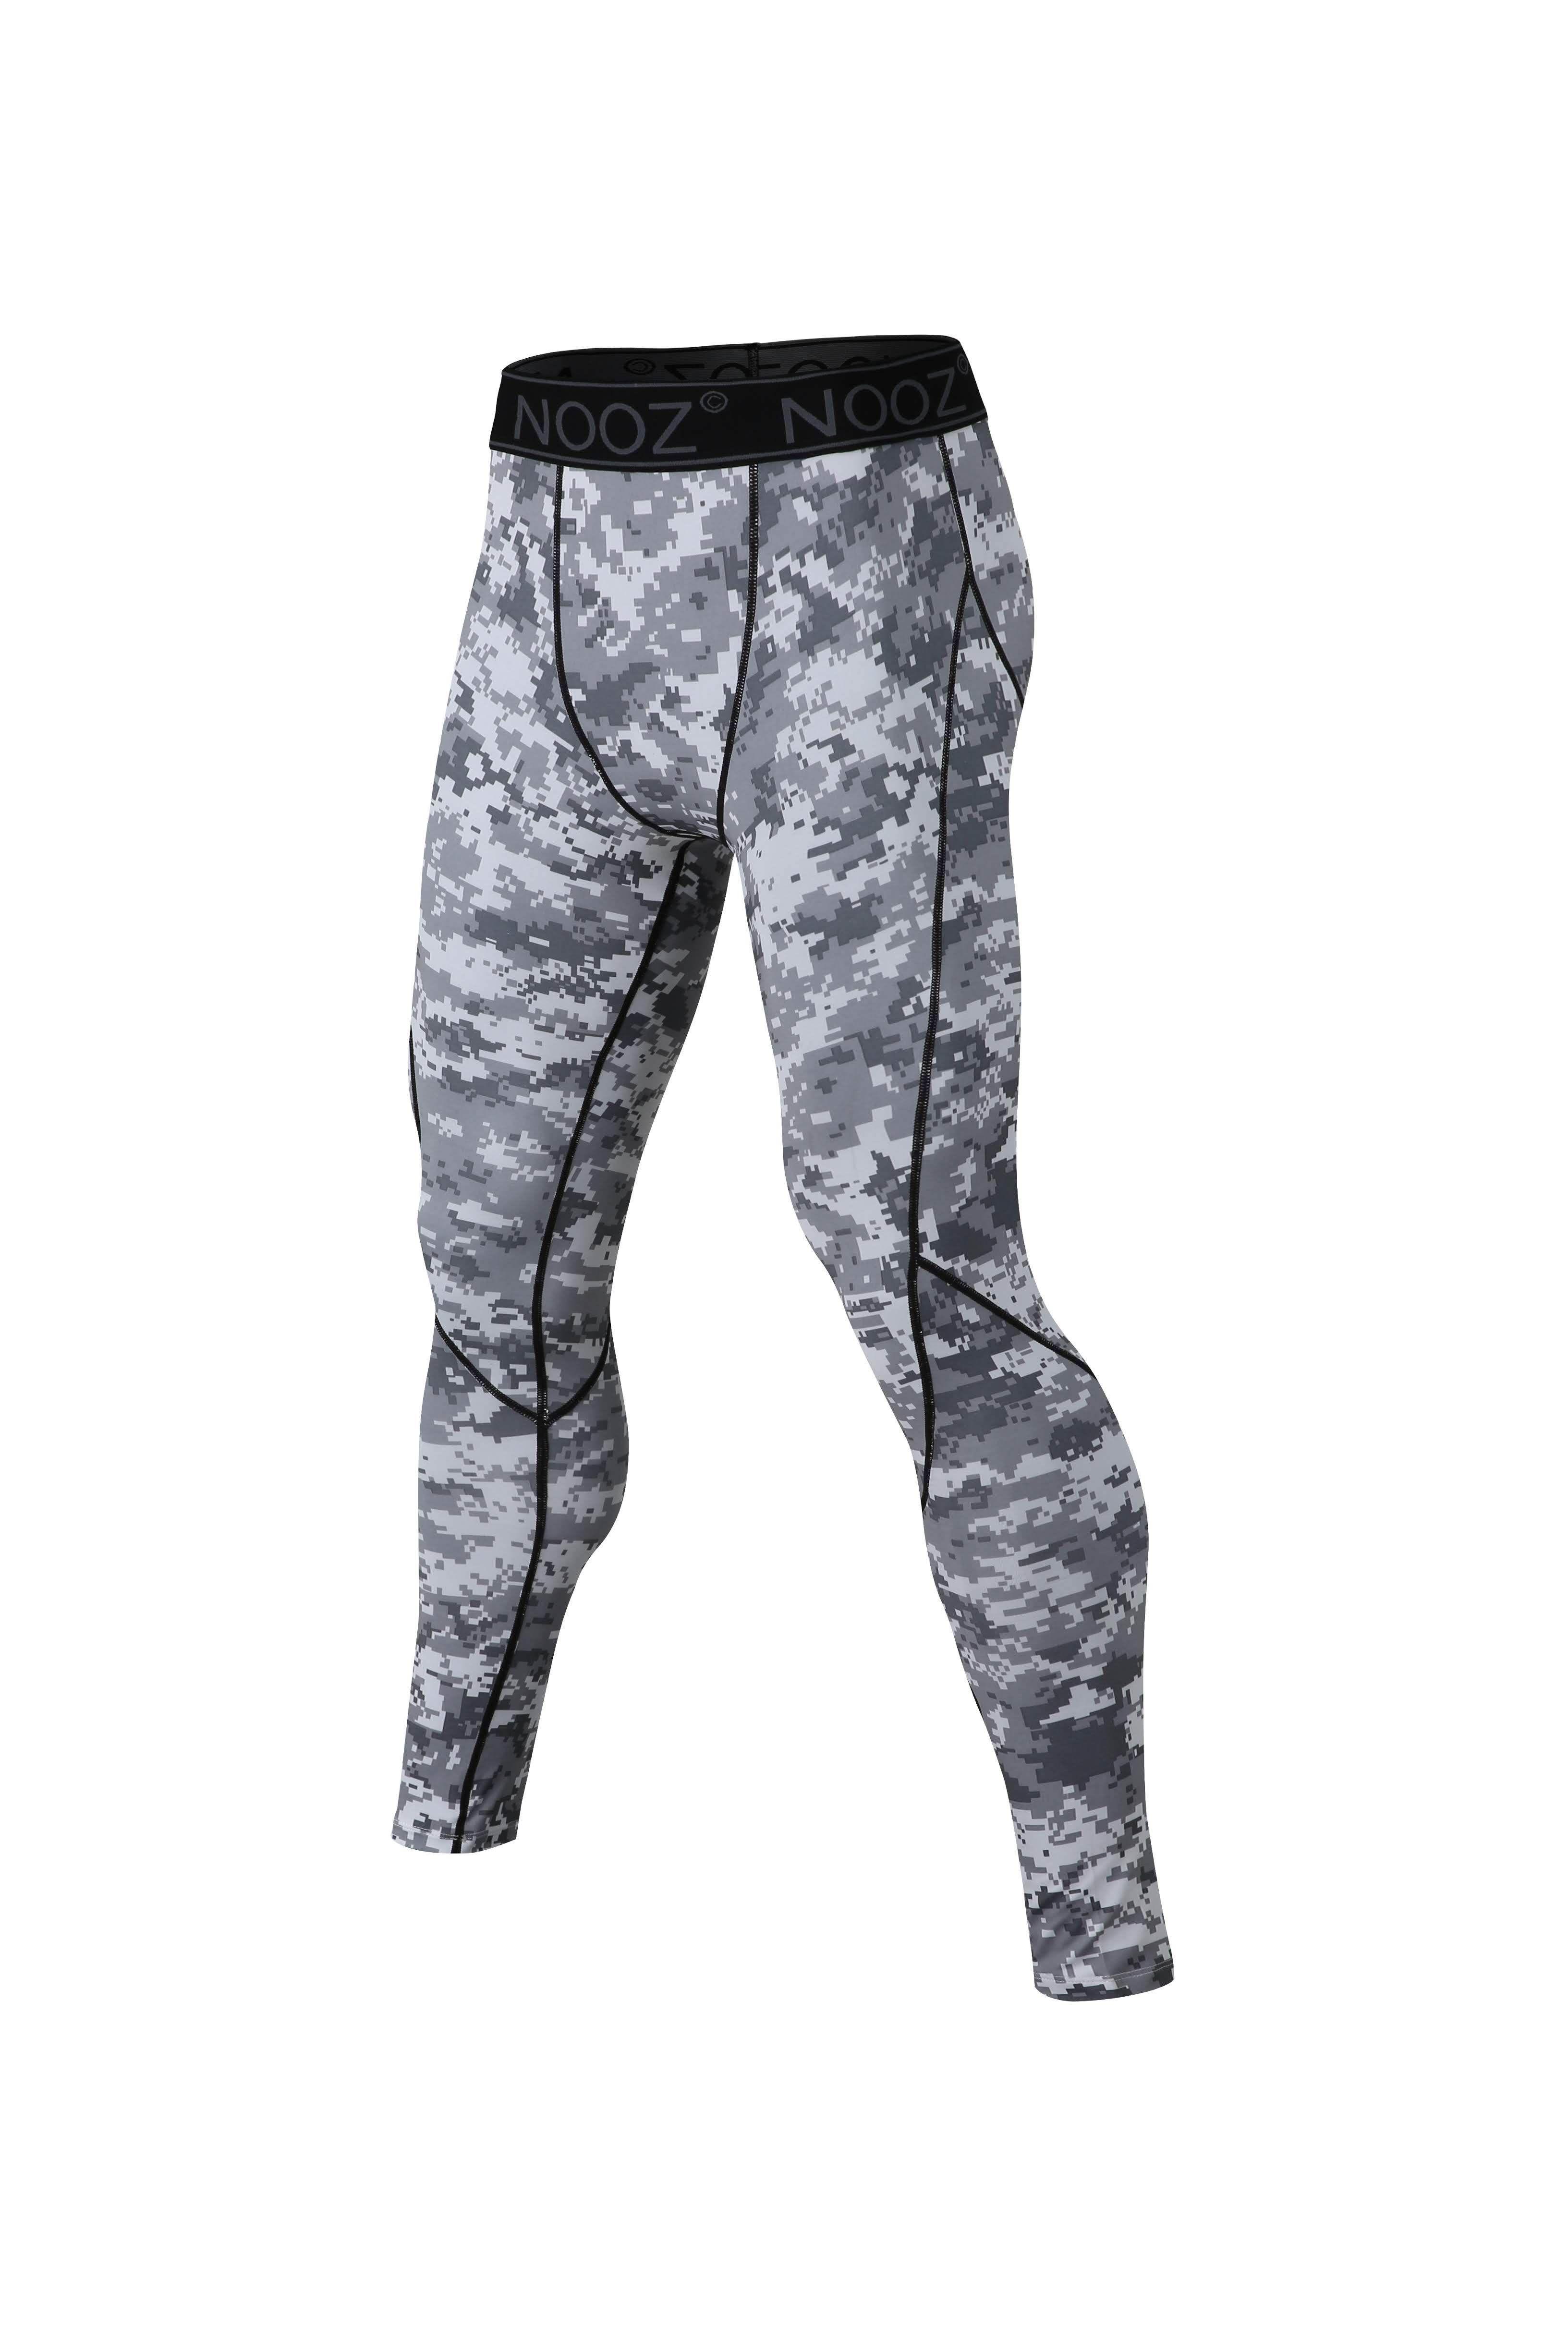 1790e3ff61038 Men's Camouflage Compression Baselayer Tights | NOOZ SPORTSWEAR ...